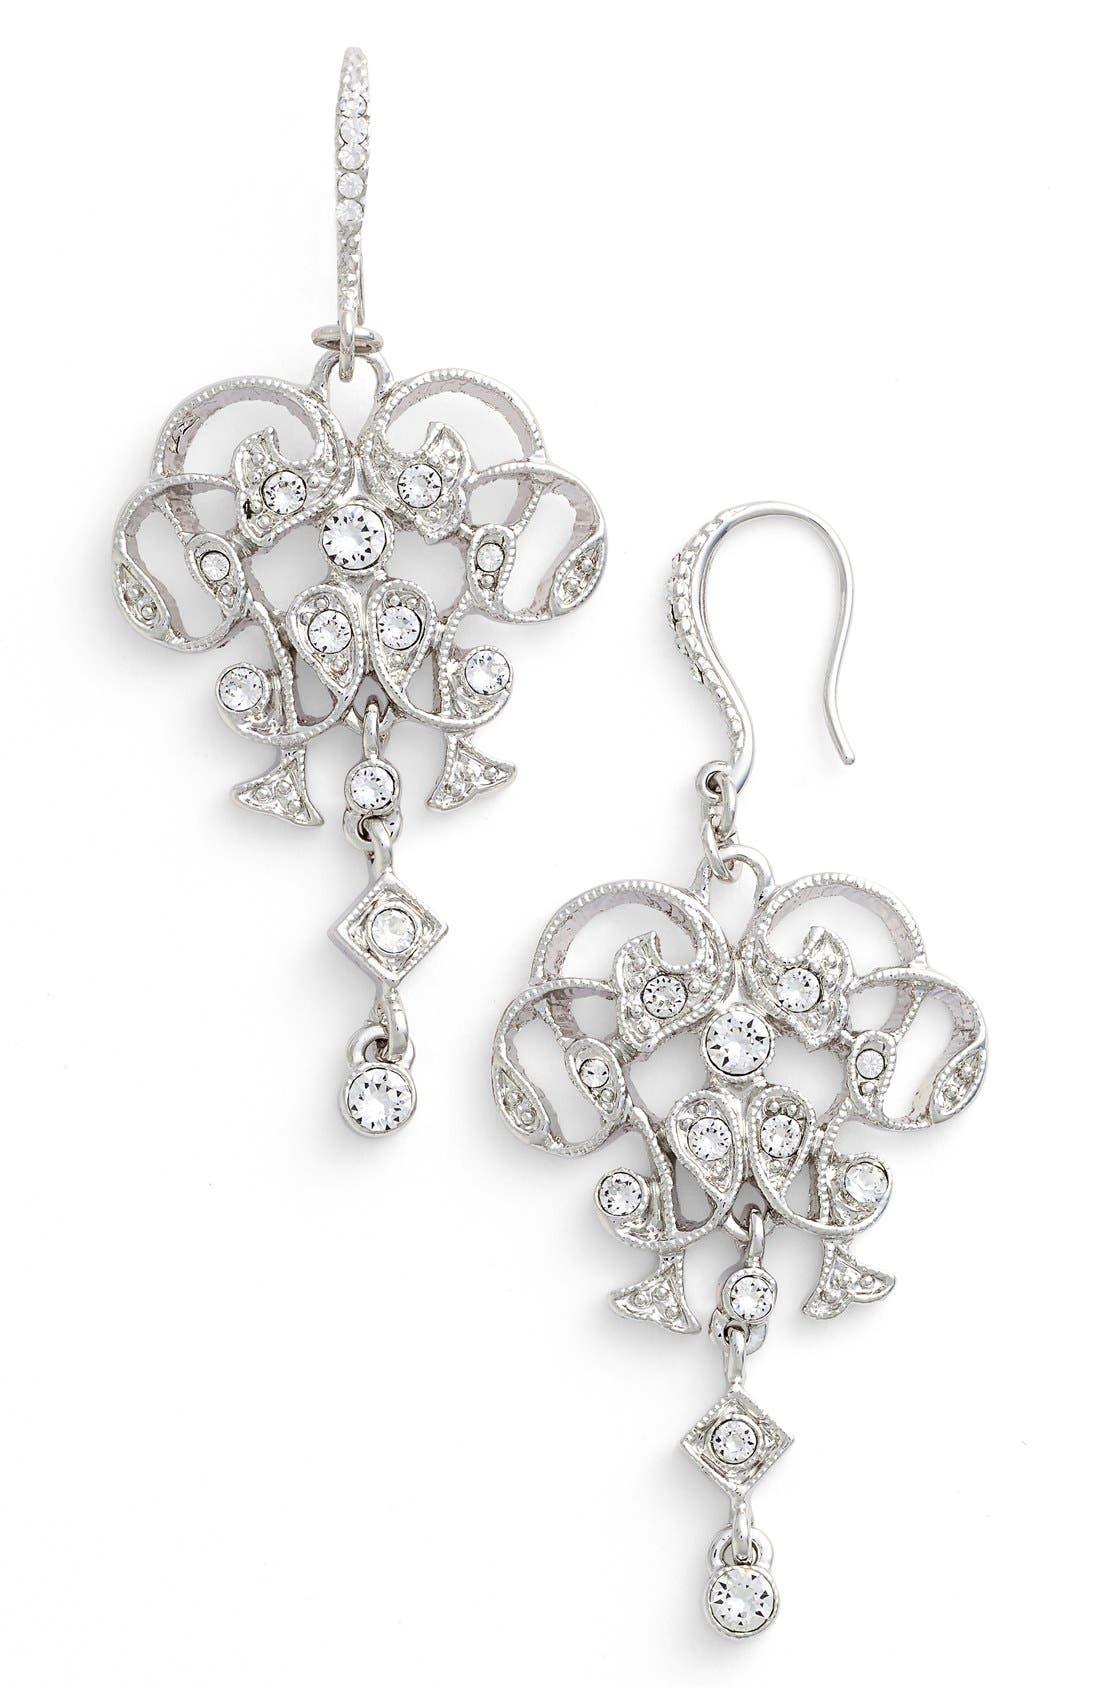 Main Image - Nina Swarovski Crystal Chandelier Earrings